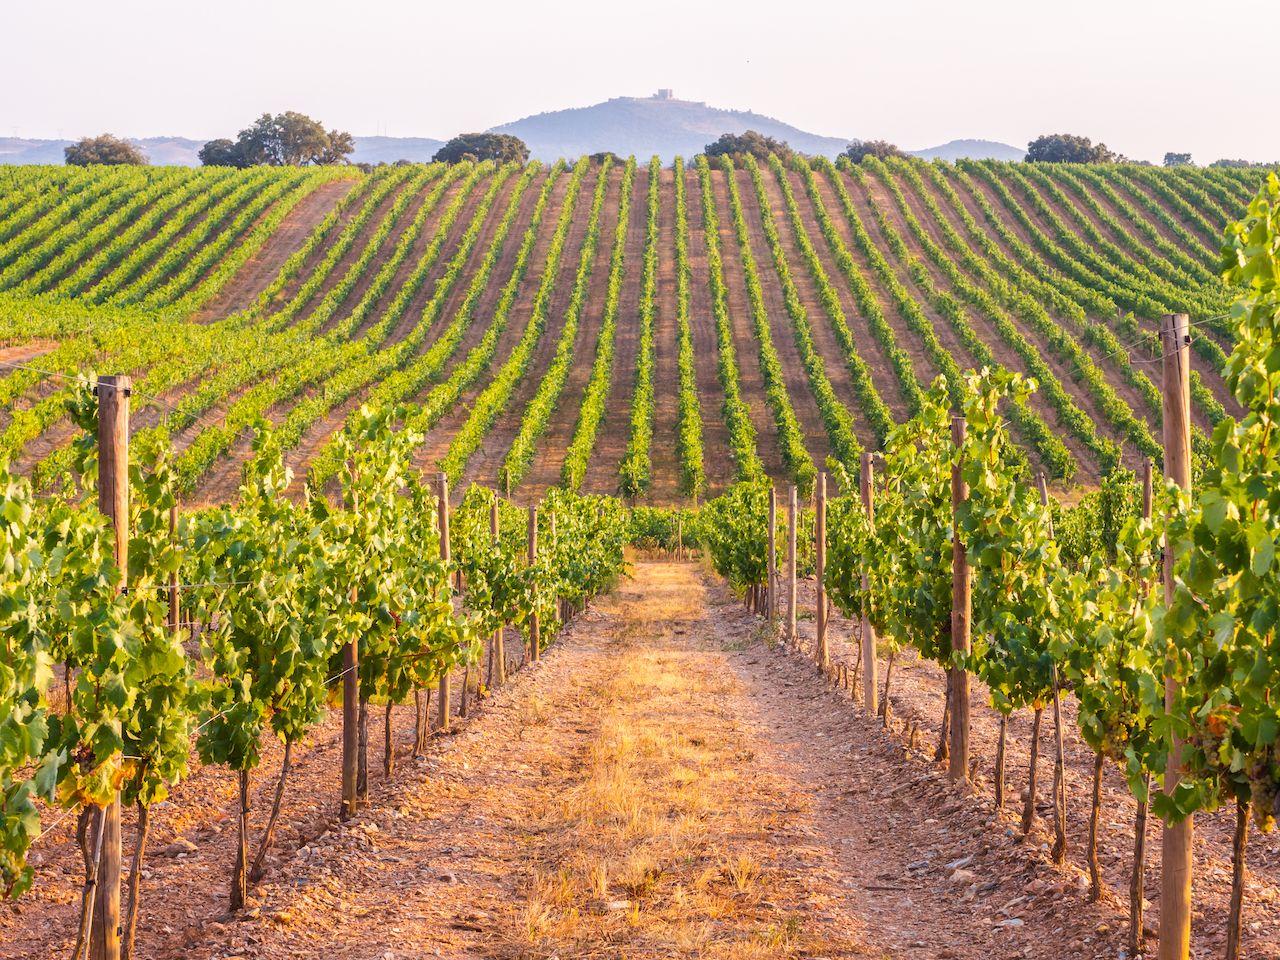 Vines in a vineyard in Alentejo region, Portugal